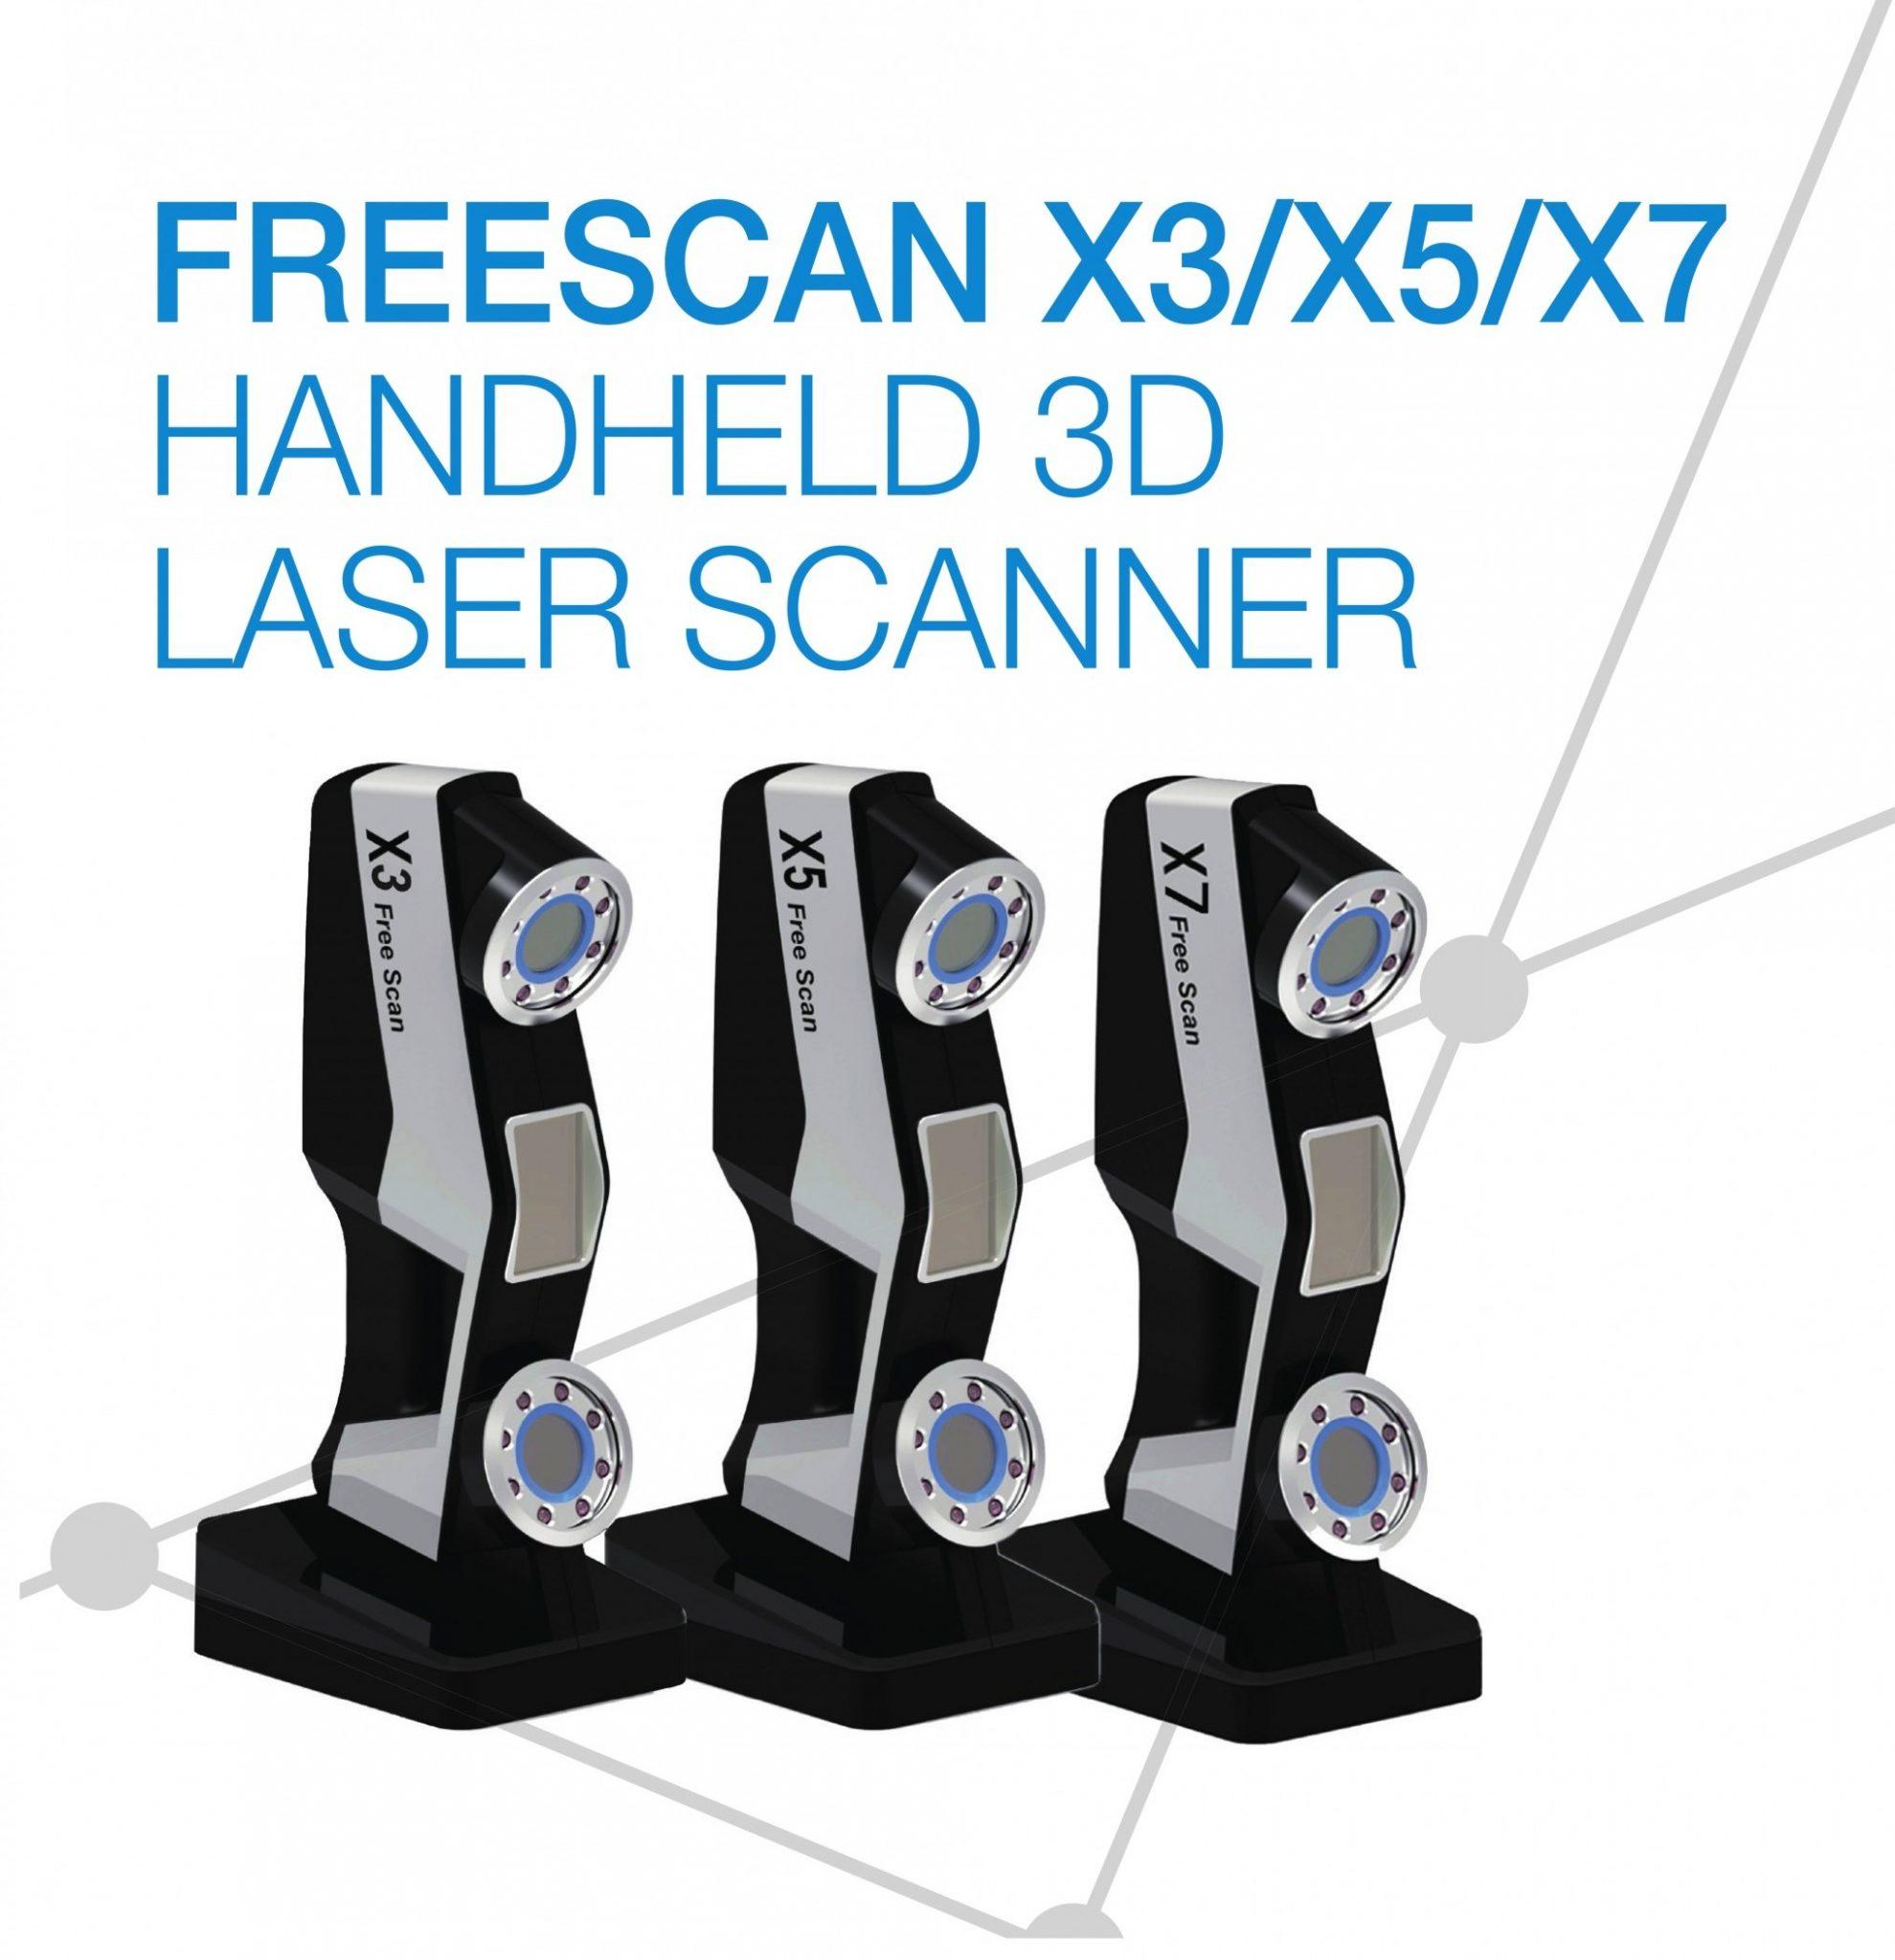 FreeScan X3/X5/X7